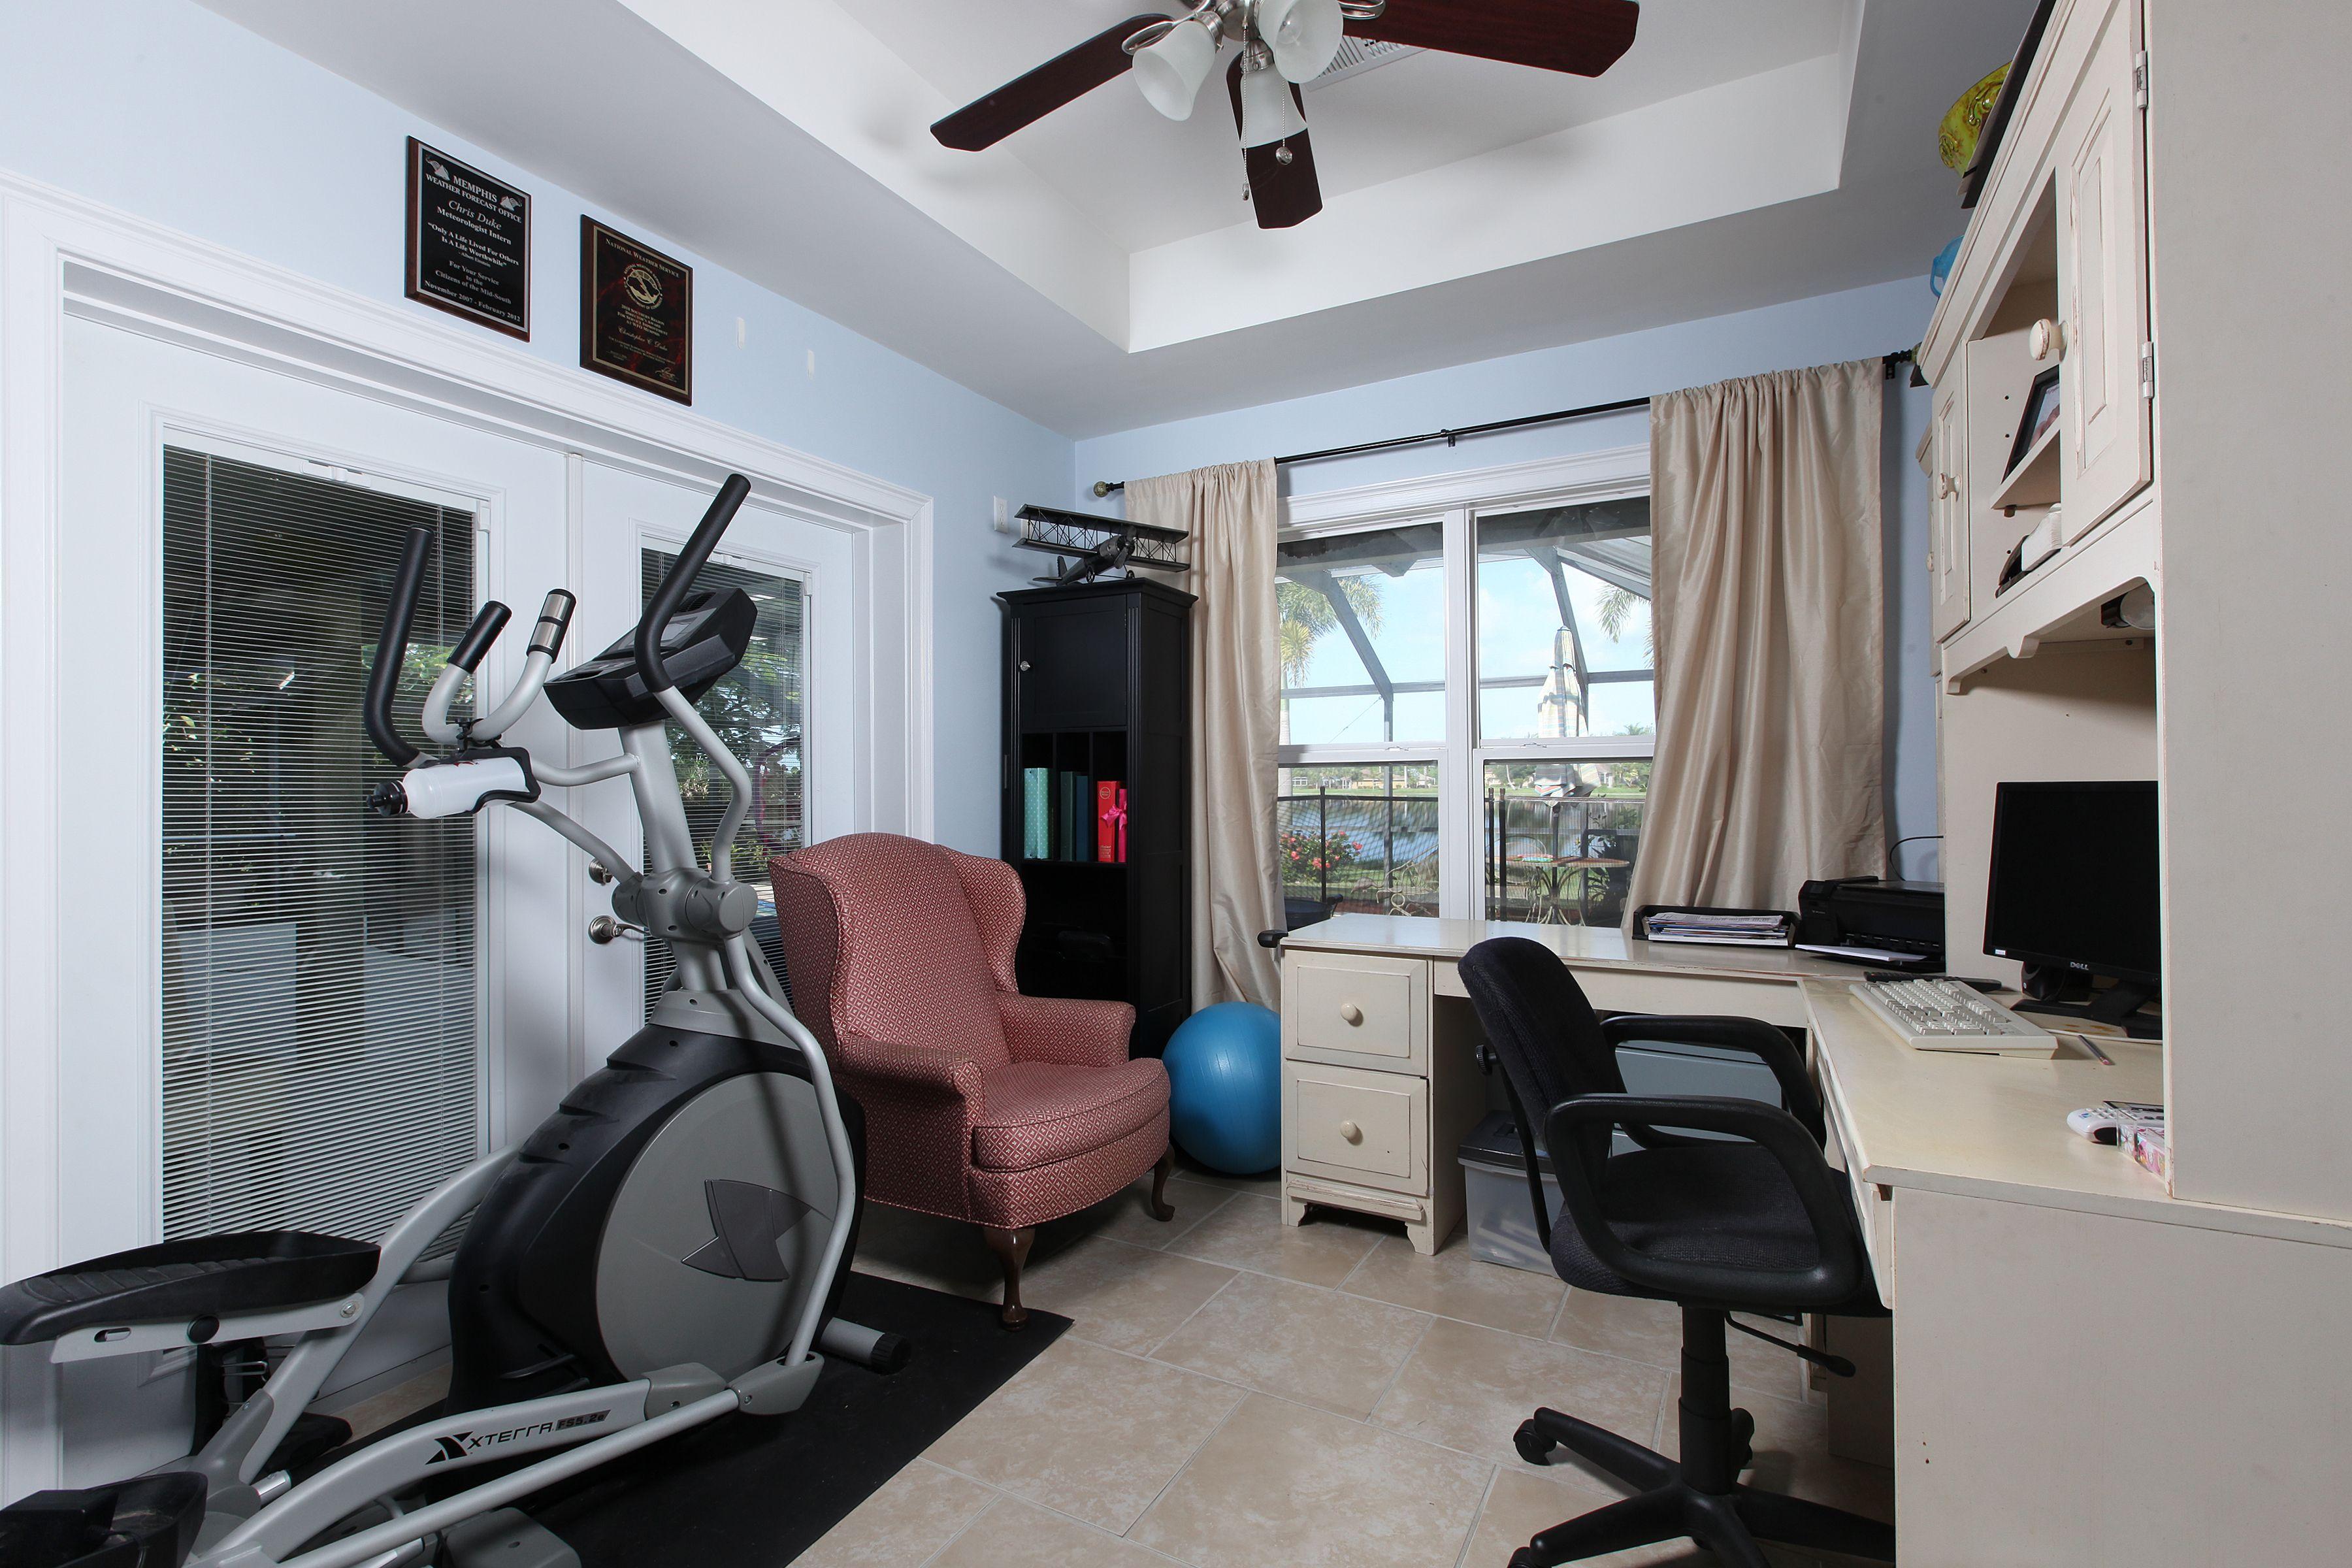 Office/Den Home, Club house